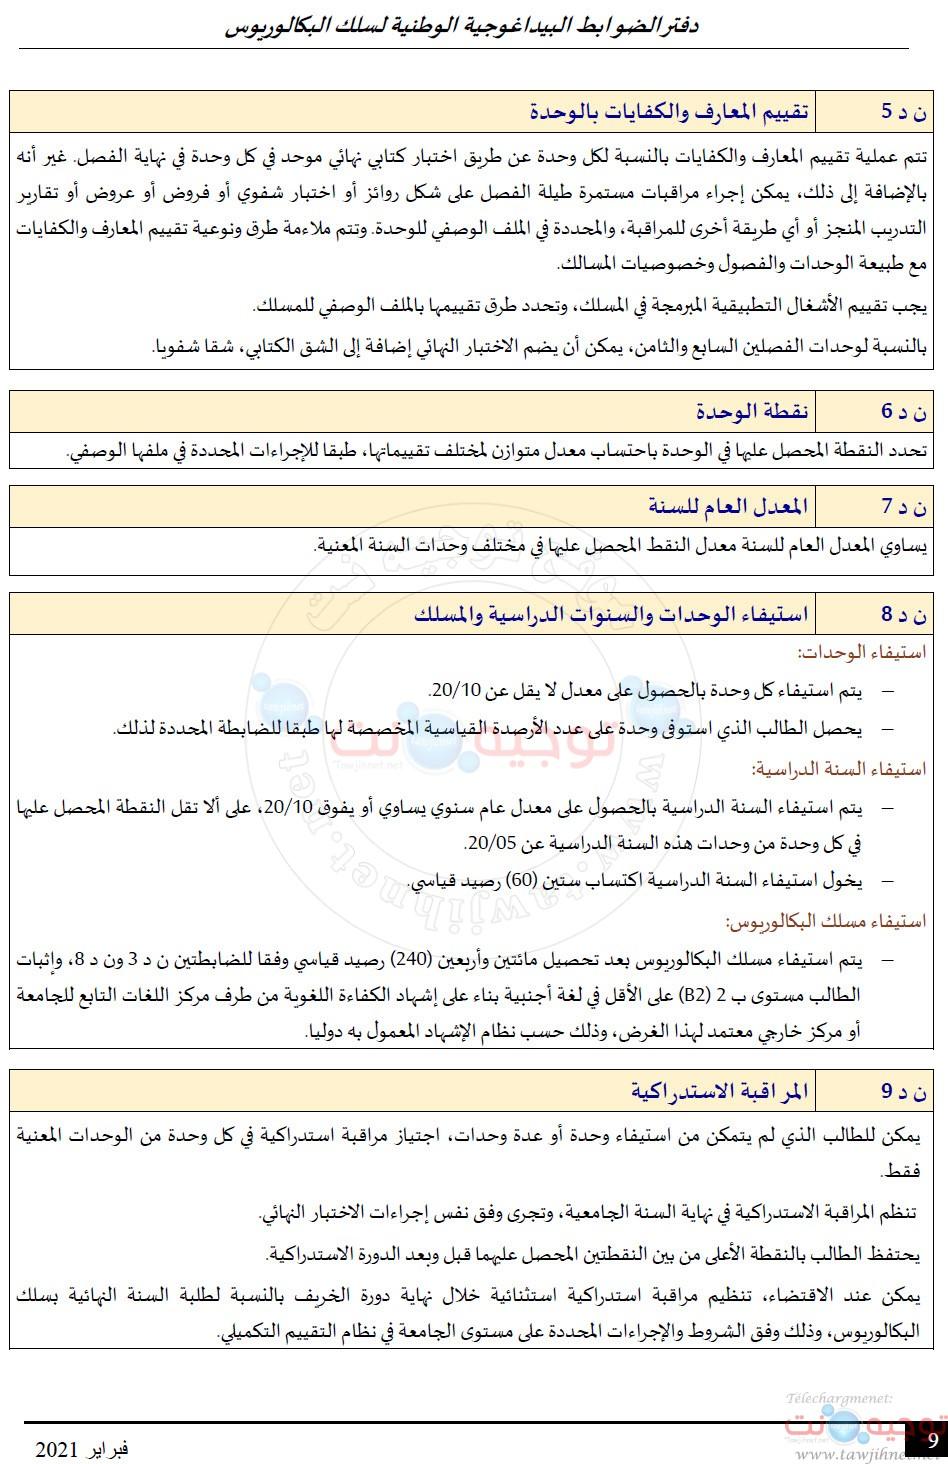 Bachelor-CNPN-normes-pedagoqiques-2021_Page_09.jpg